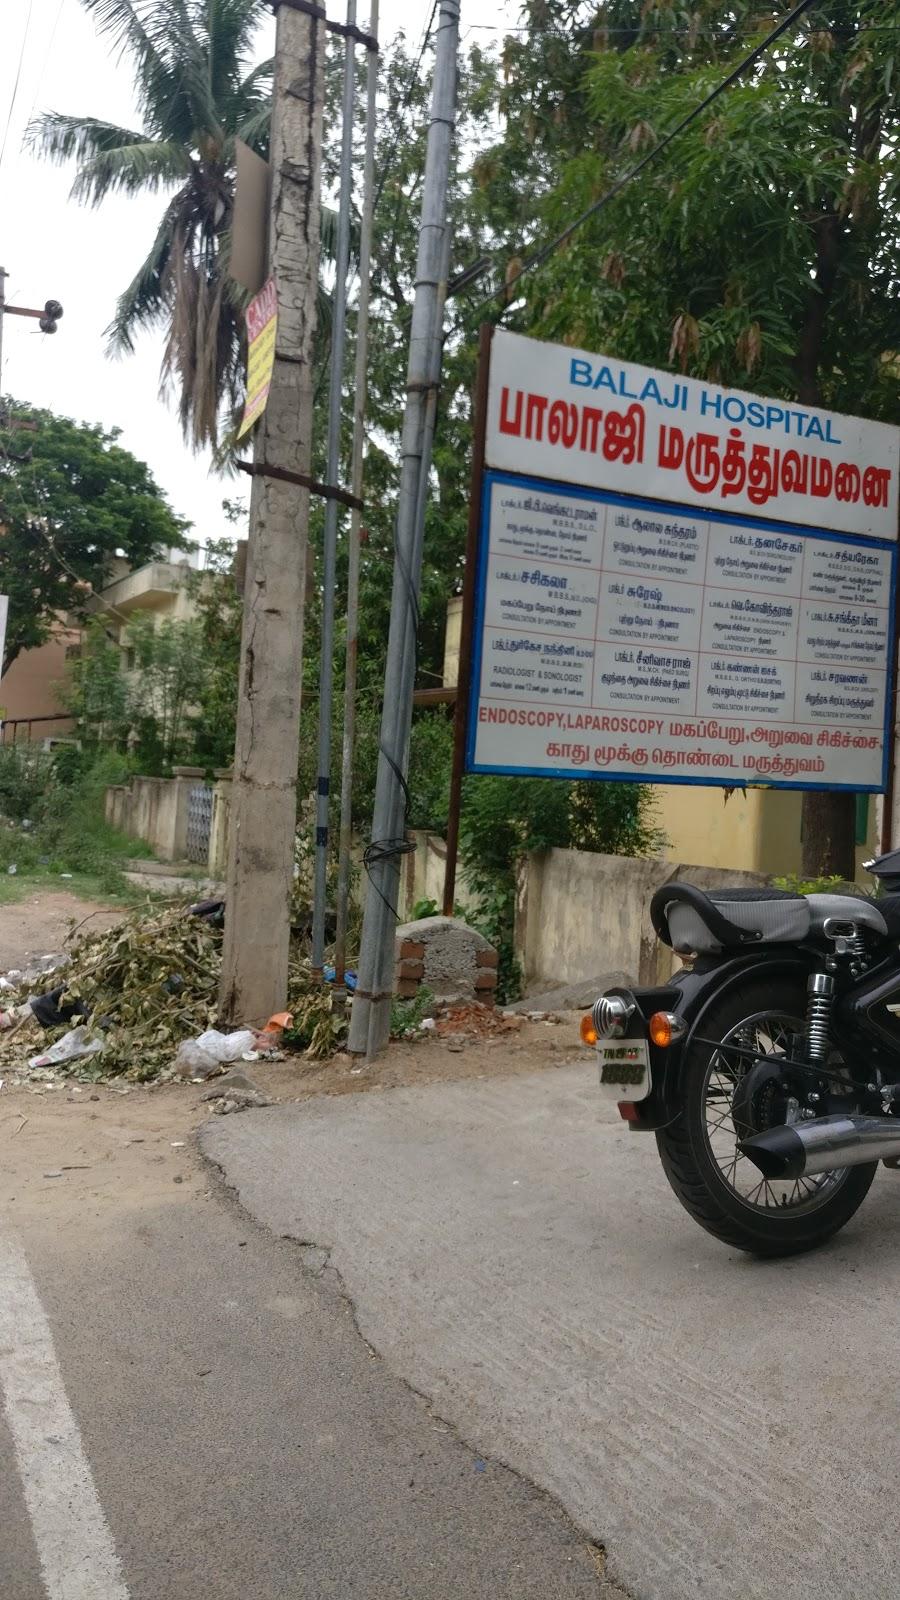 Balaji Hospital (Multi Speciality Hospital Chengalpattu) Chengalpattu Tamil Nadu